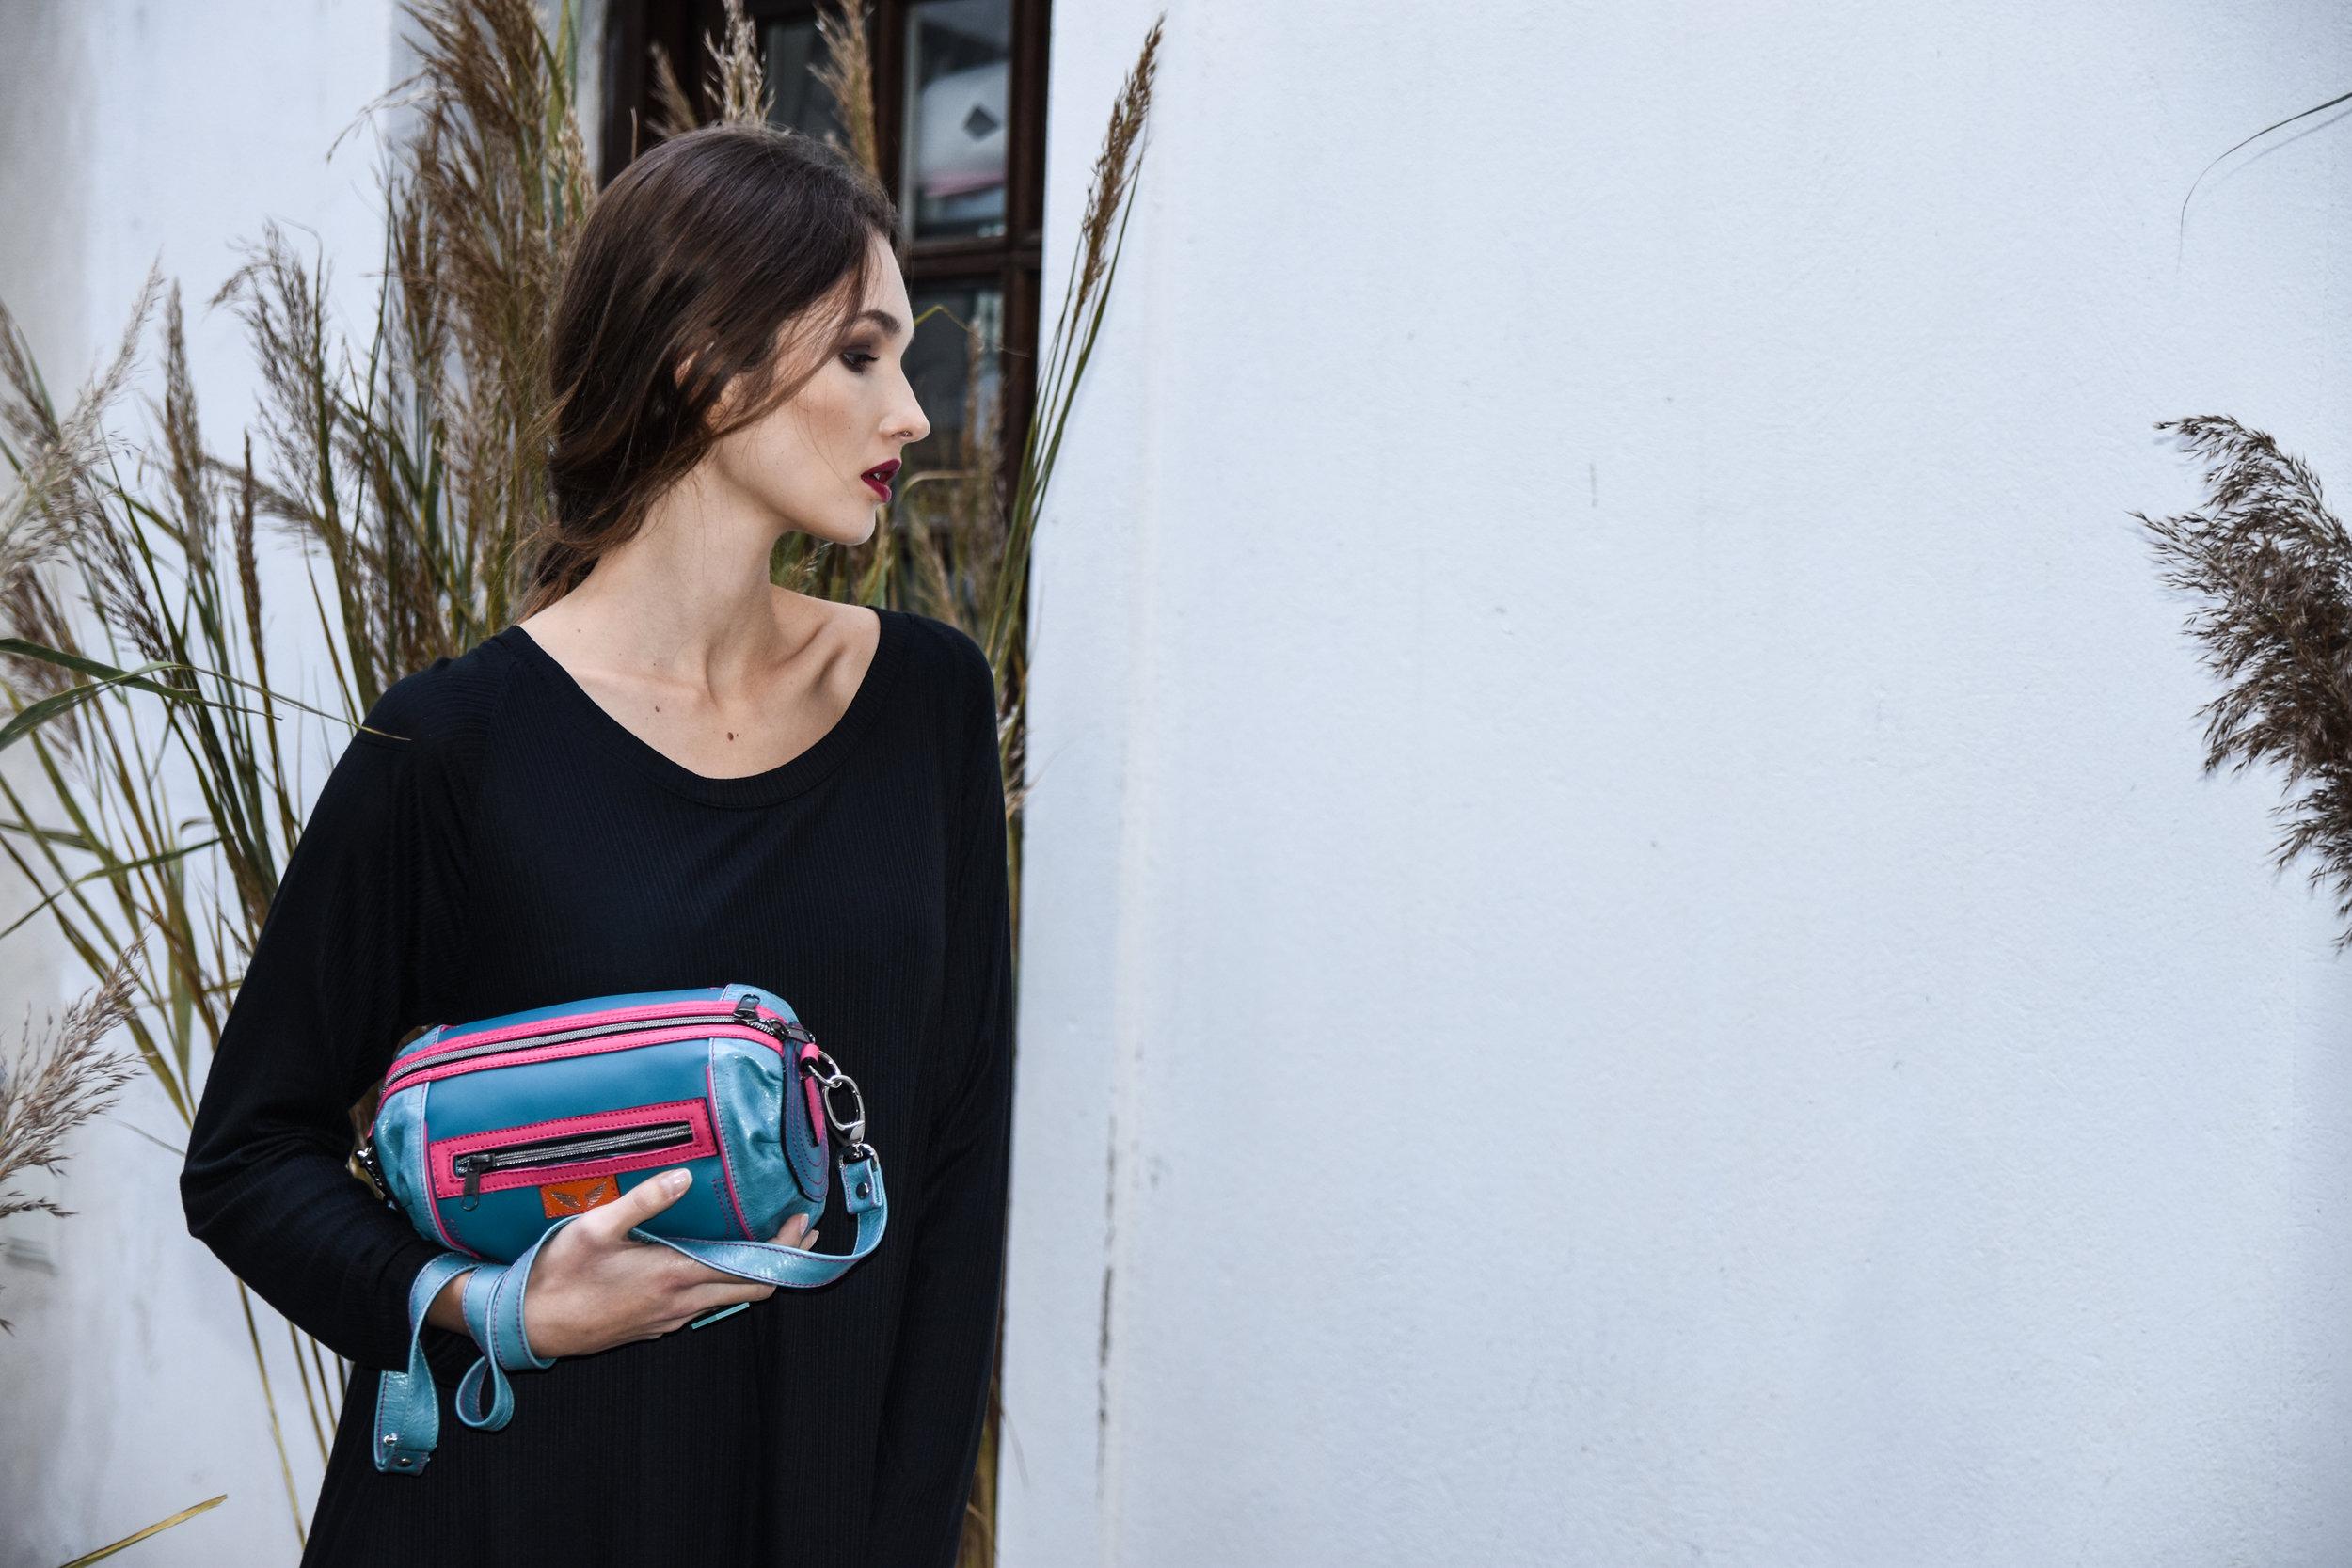 Sui prstan 19,90 eur  Zelolepo torba 180 eur  NI obleka 98 eur